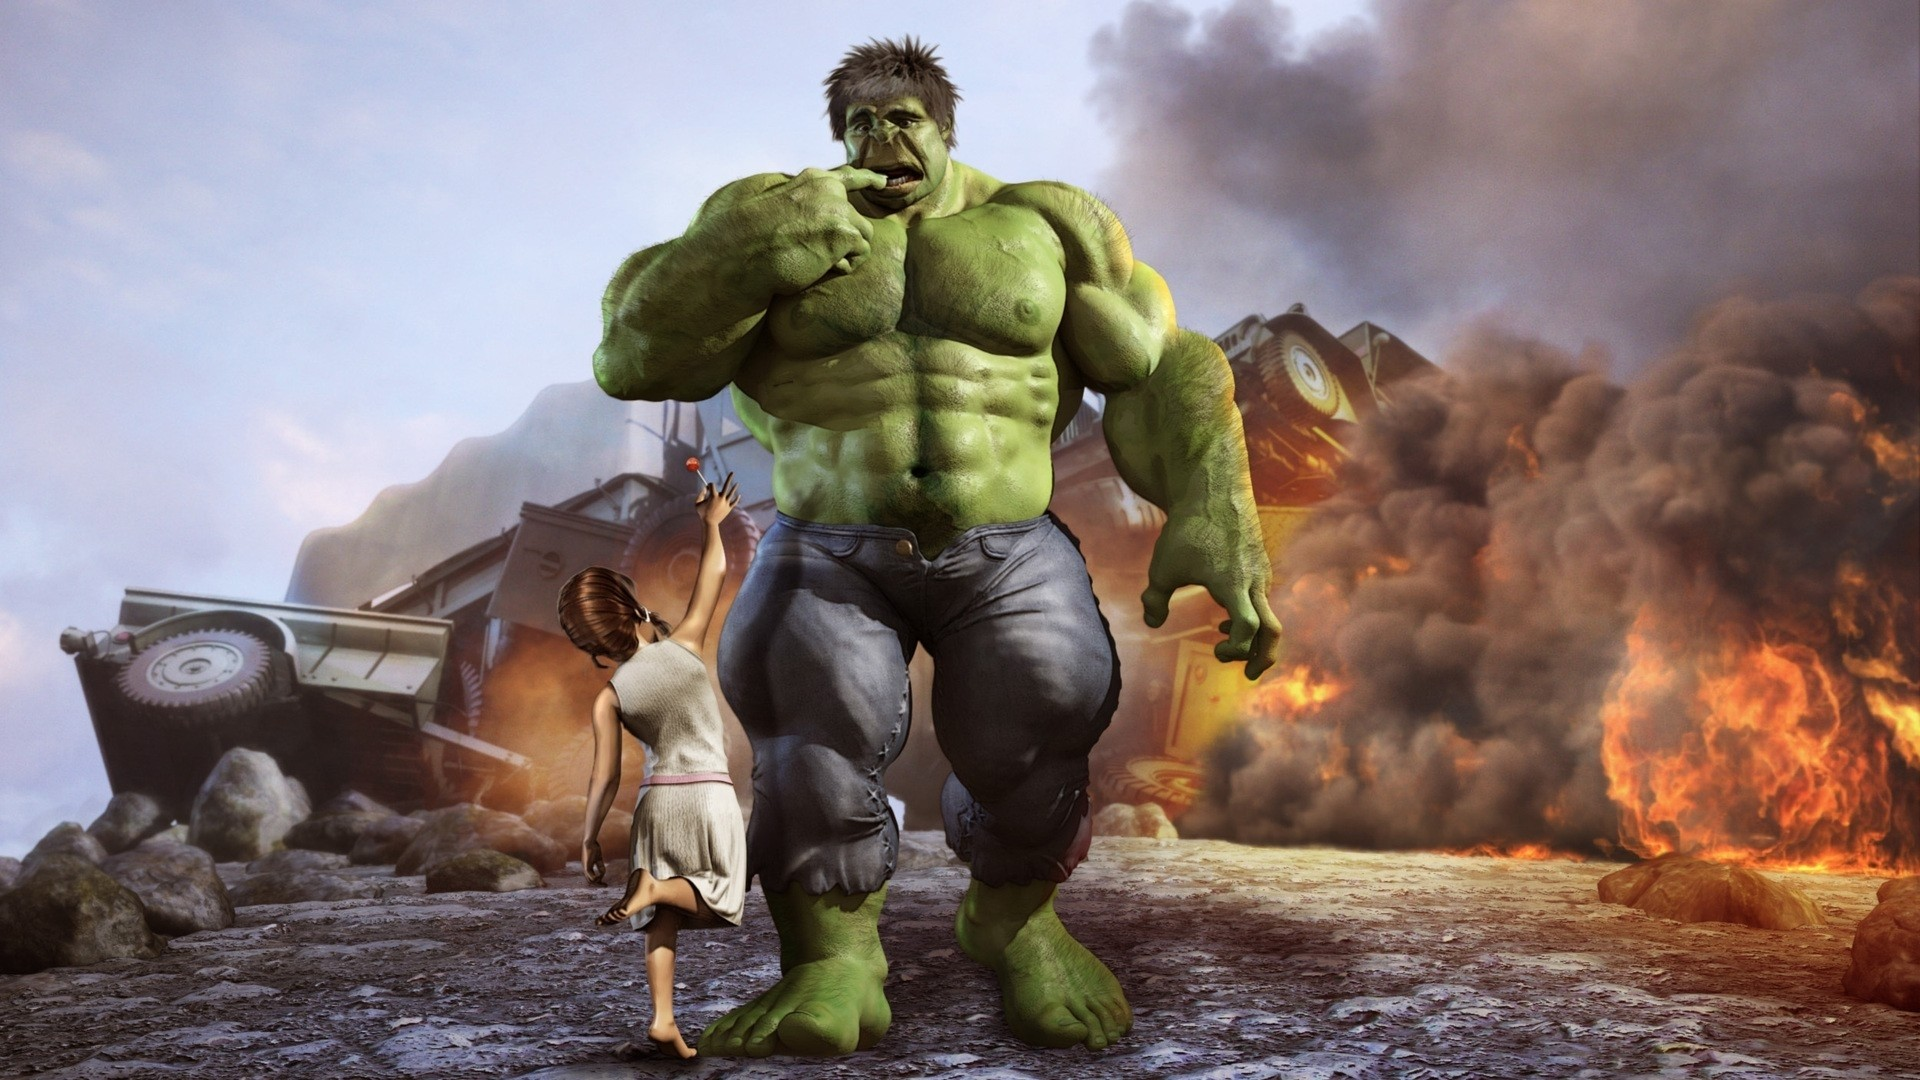 hulk comic character cgi marvel comics 3d modeling Wallpaper HD